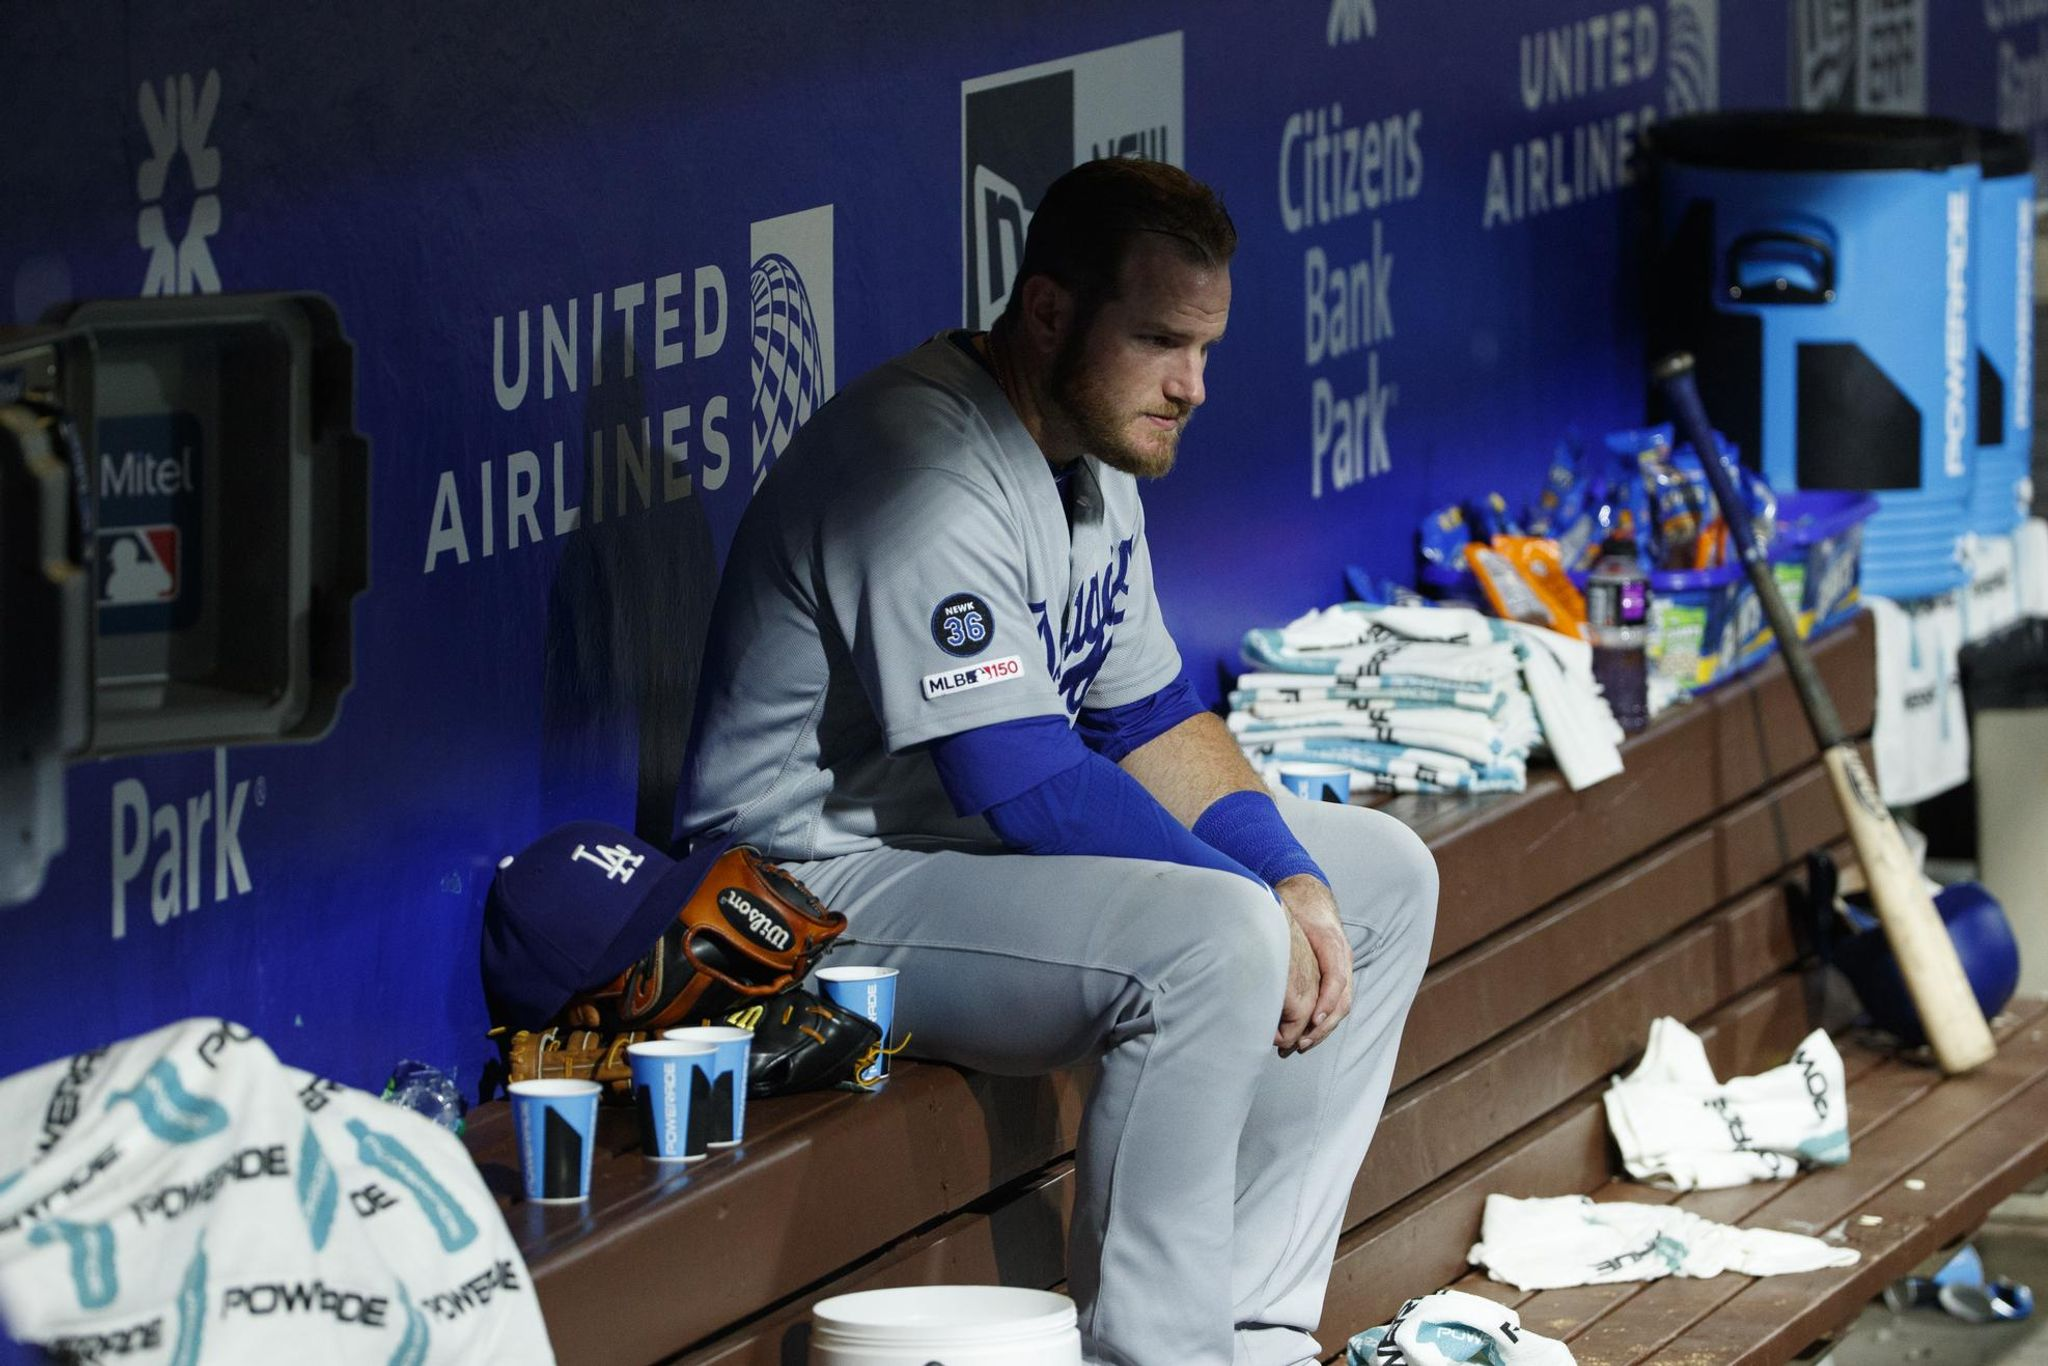 Dodgers_phillies_baseball_34563_s2048x1366